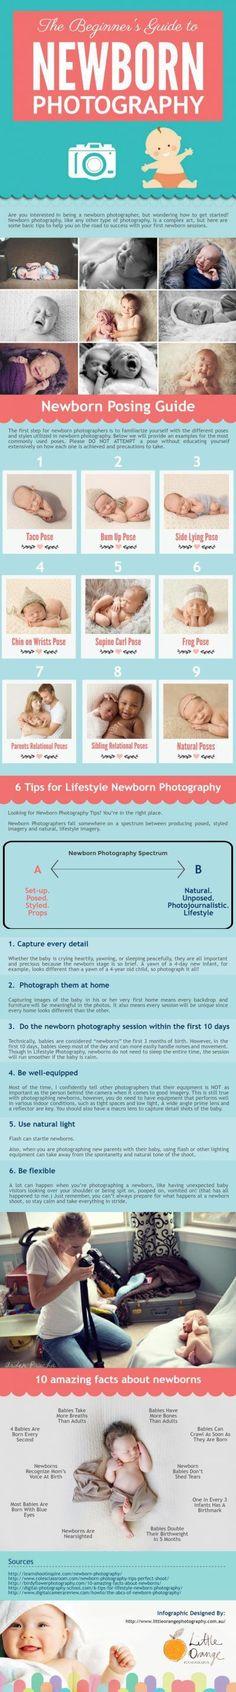 DIY Newborn Photography Photoshoot Creativity And Newborn - 25 brilliantly geeky newborn photoshoots